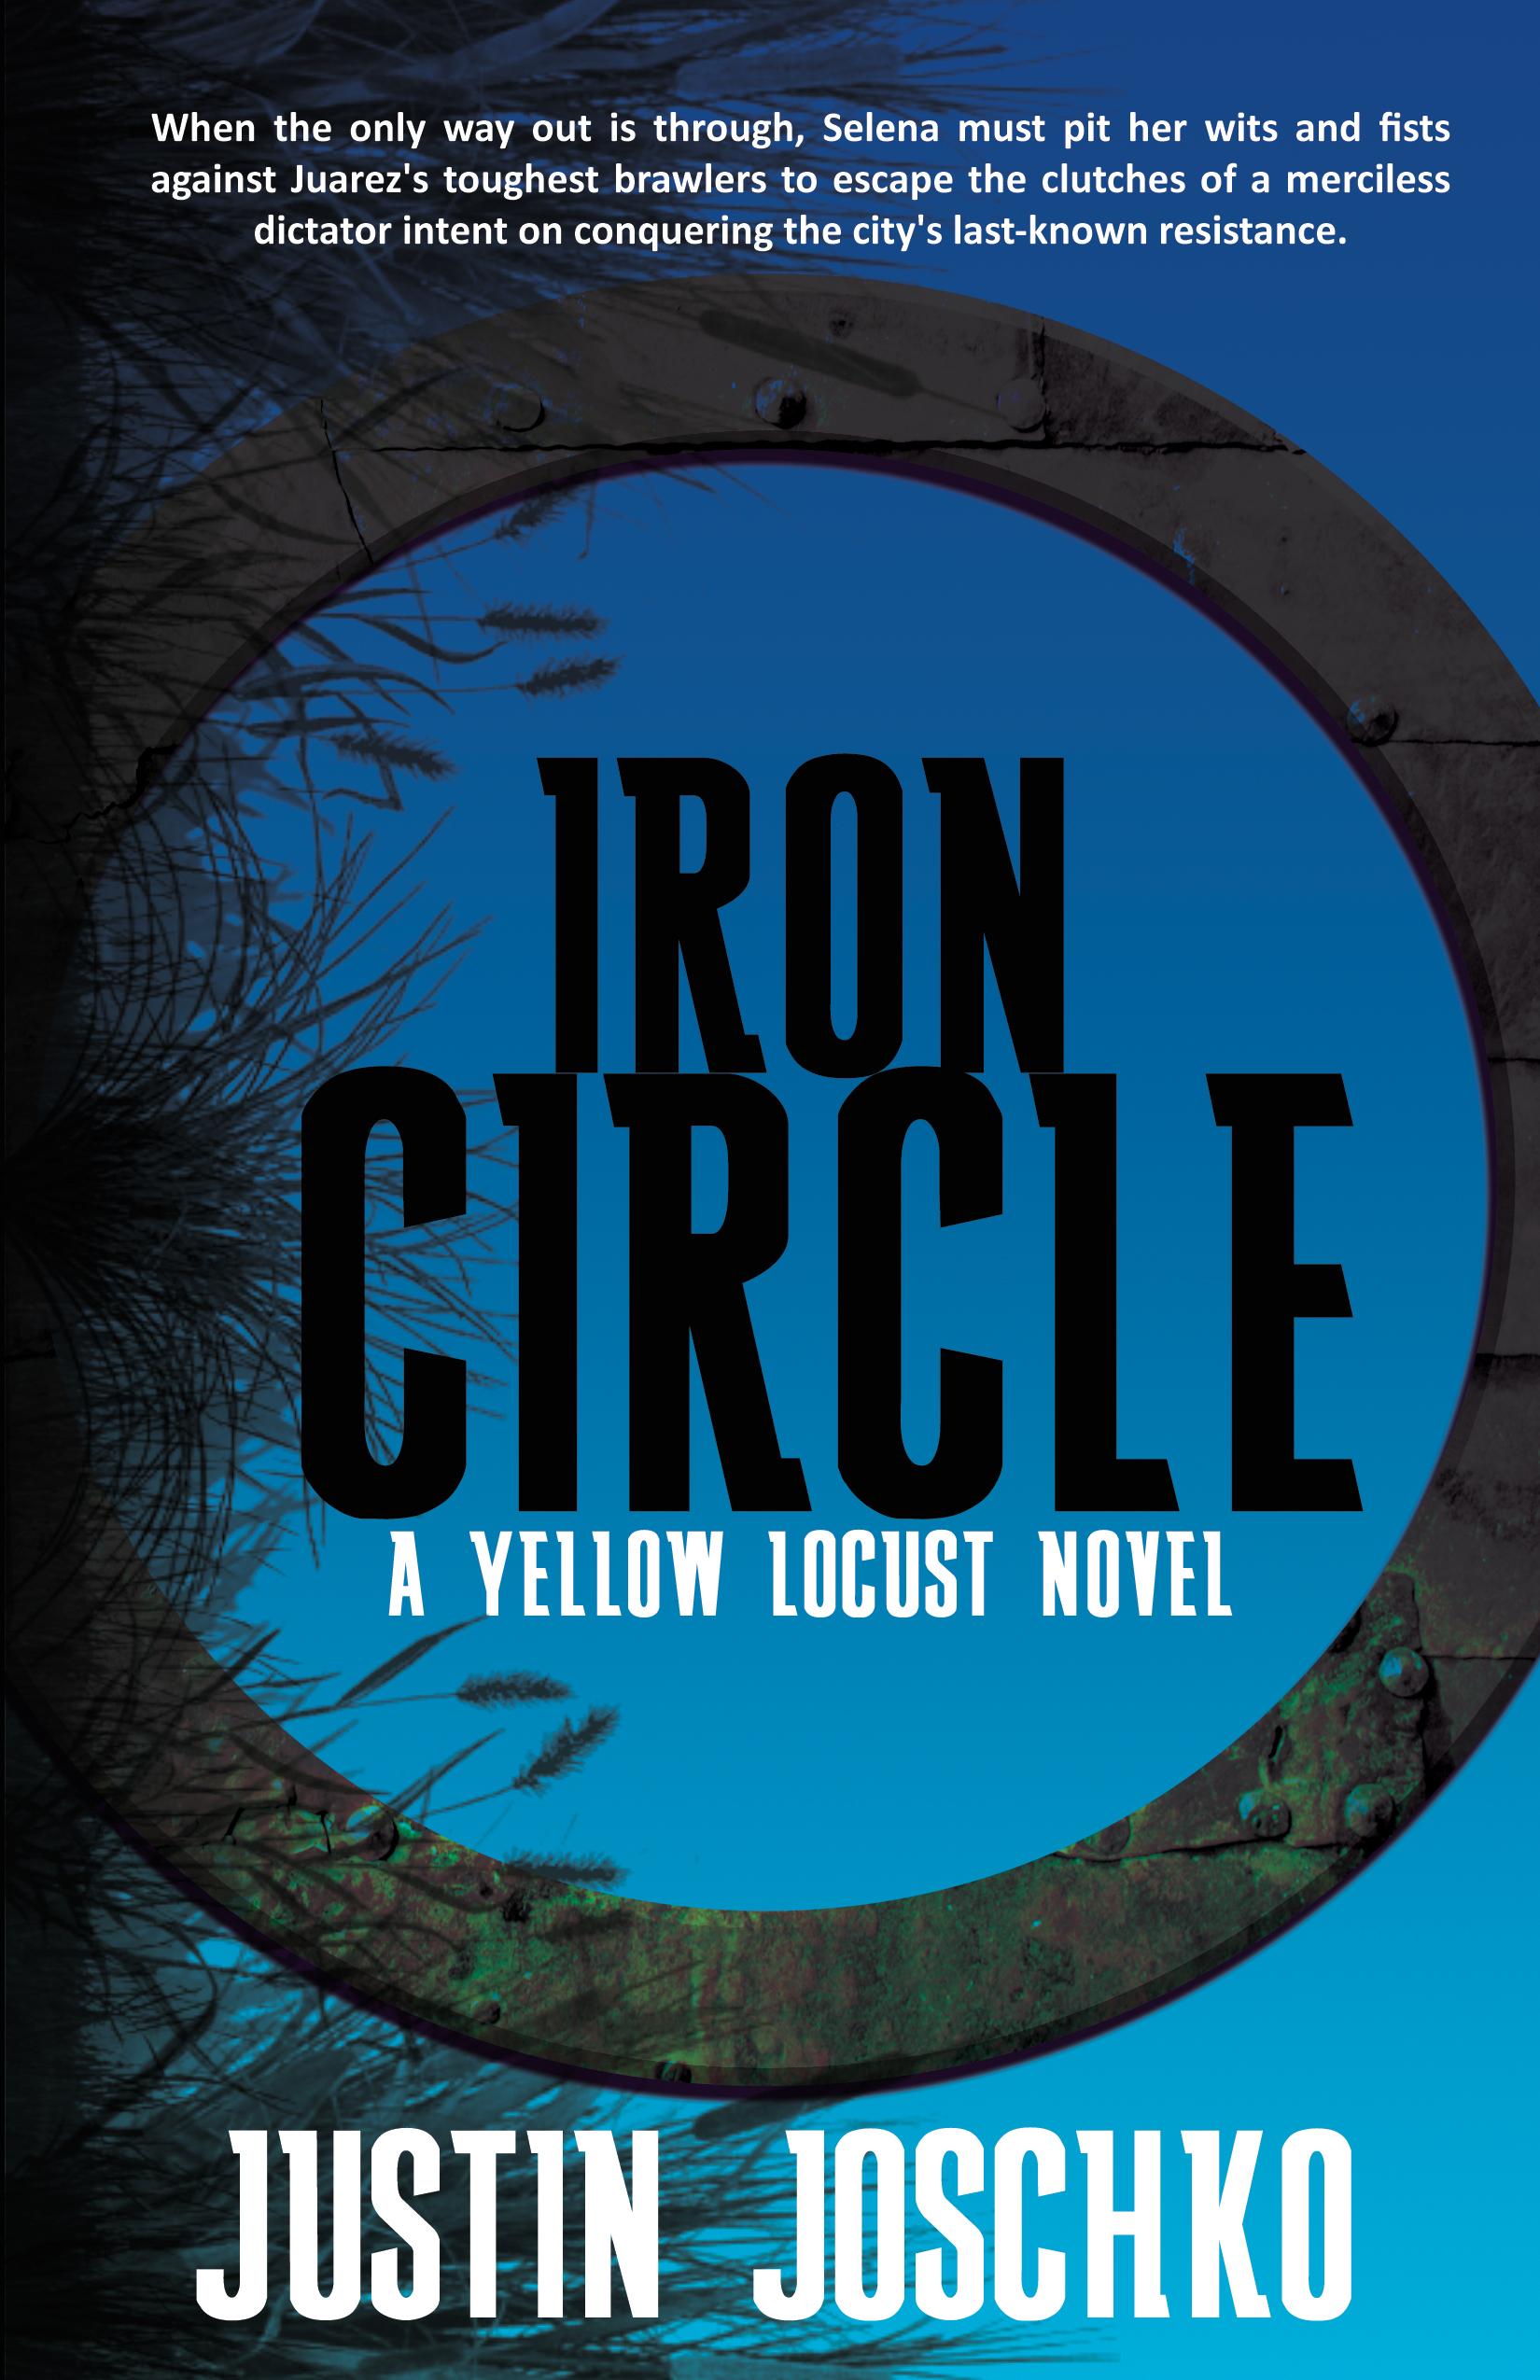 Iron Circle Justin Joschko.jpg